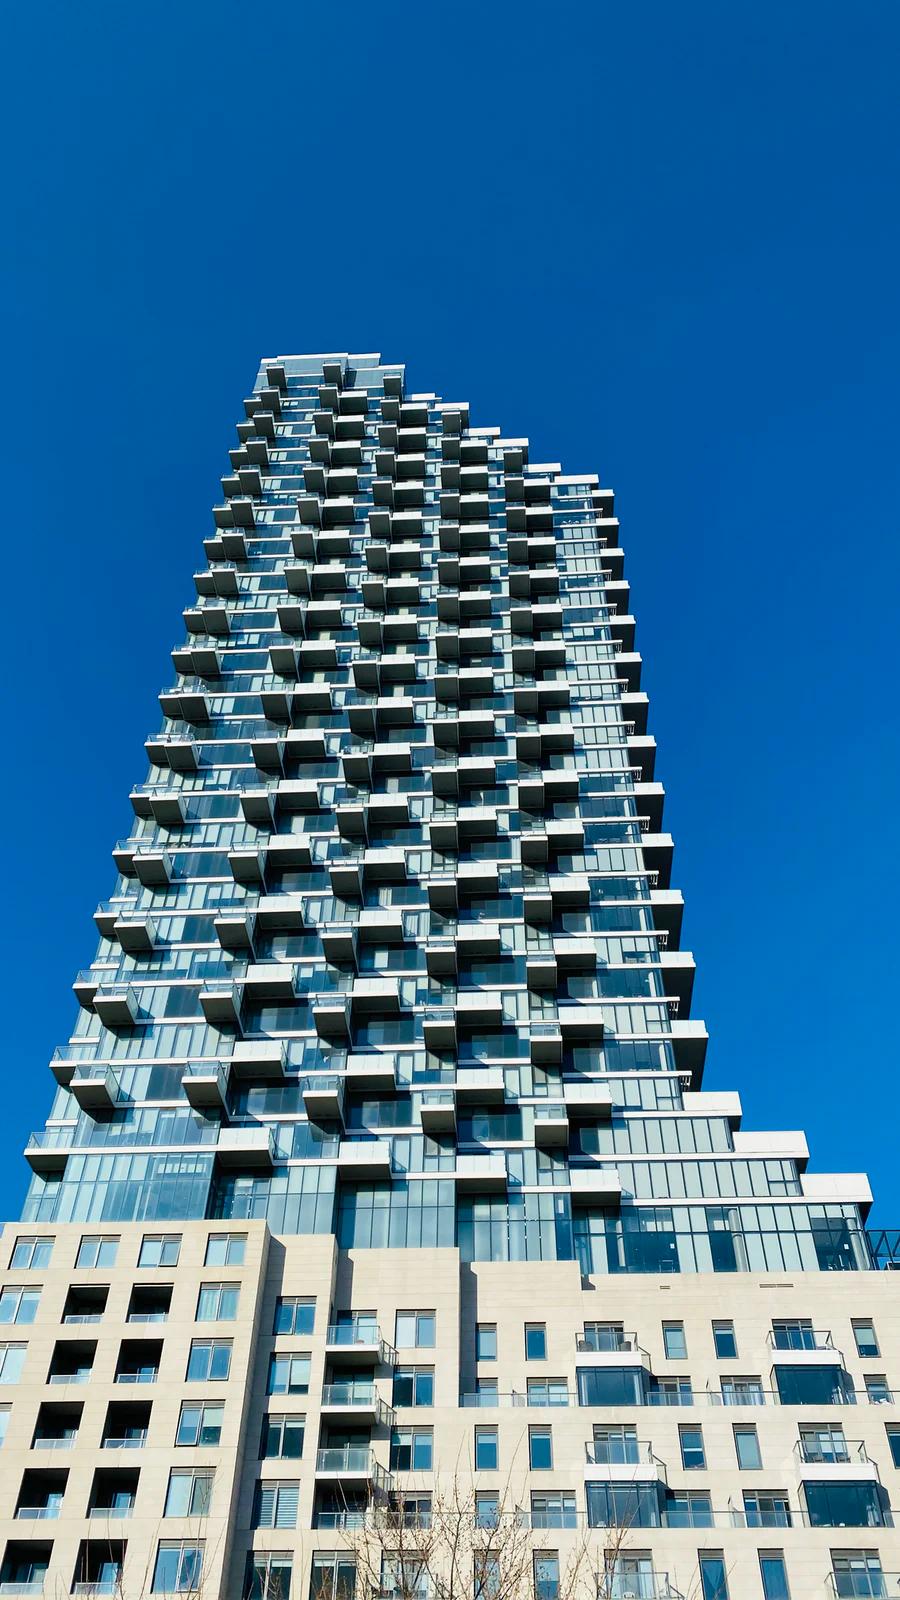 Condo Tower looking up toward sky